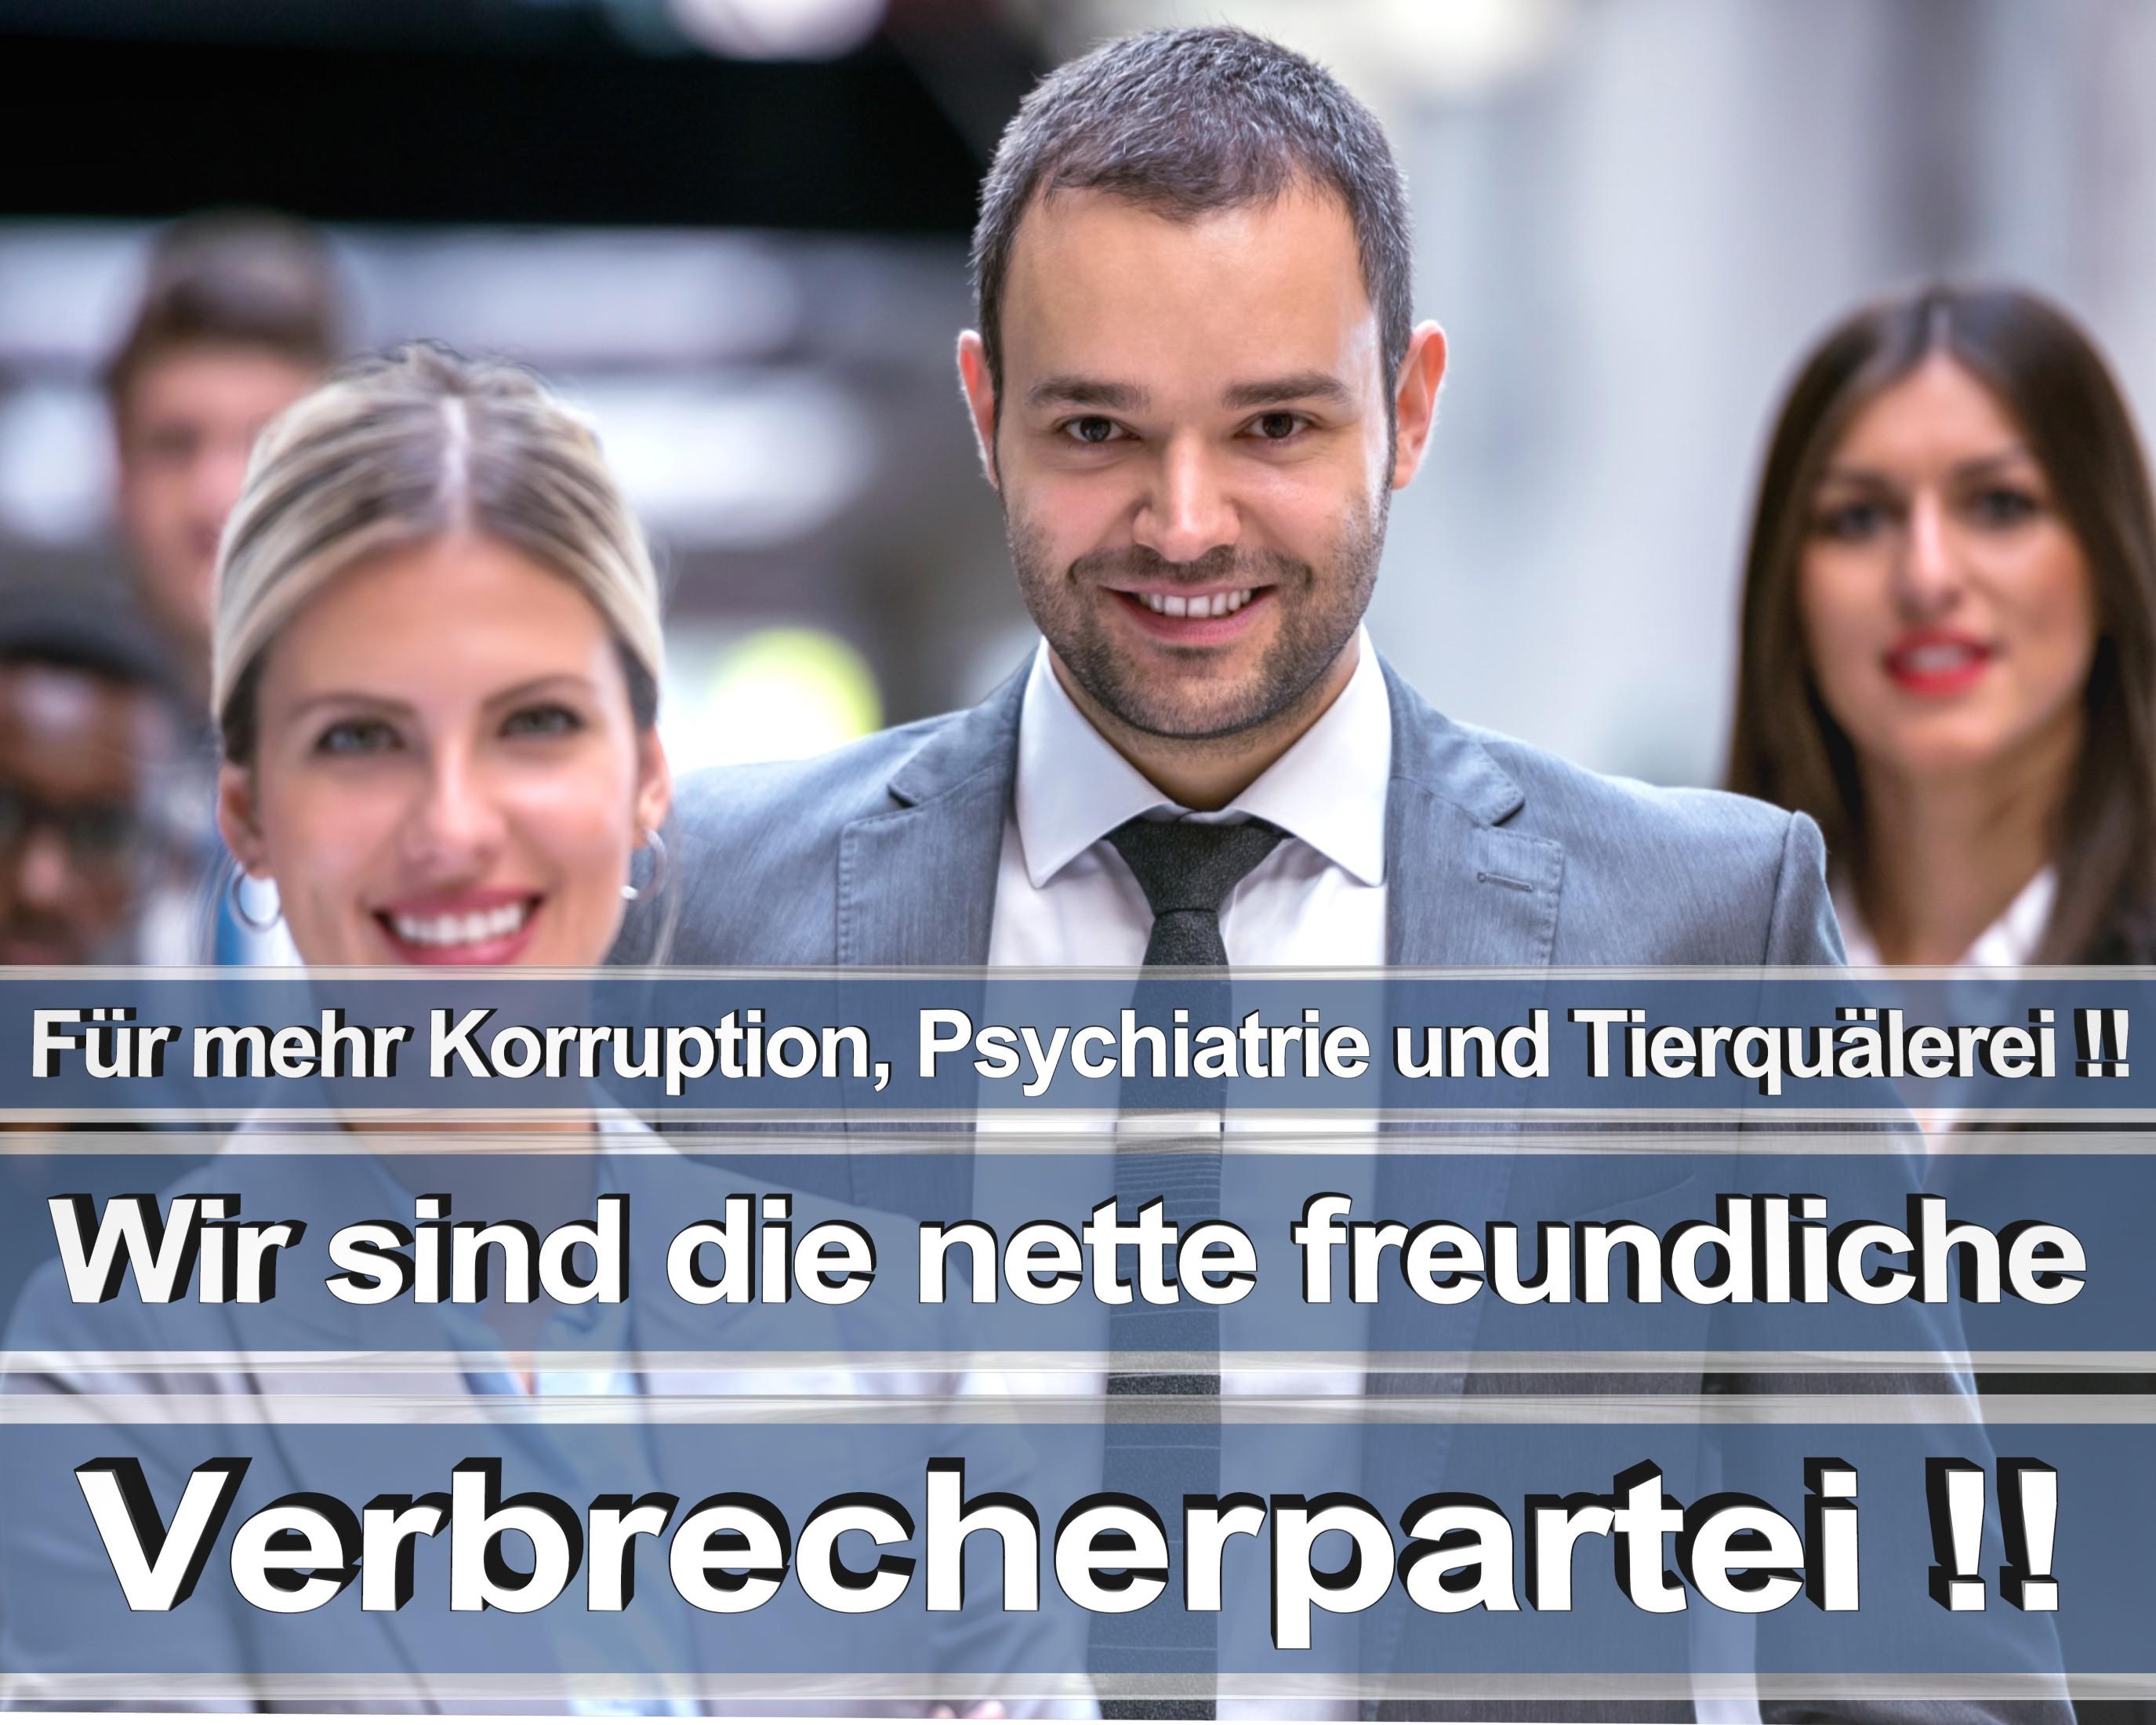 FDP Bielefeld Jan Maik Schlifter, Jasmin Wahl Schwentker, Jens Andernacht, Laura Schubert, Dr Klaus Schleicher, Rainer Seifert (13)